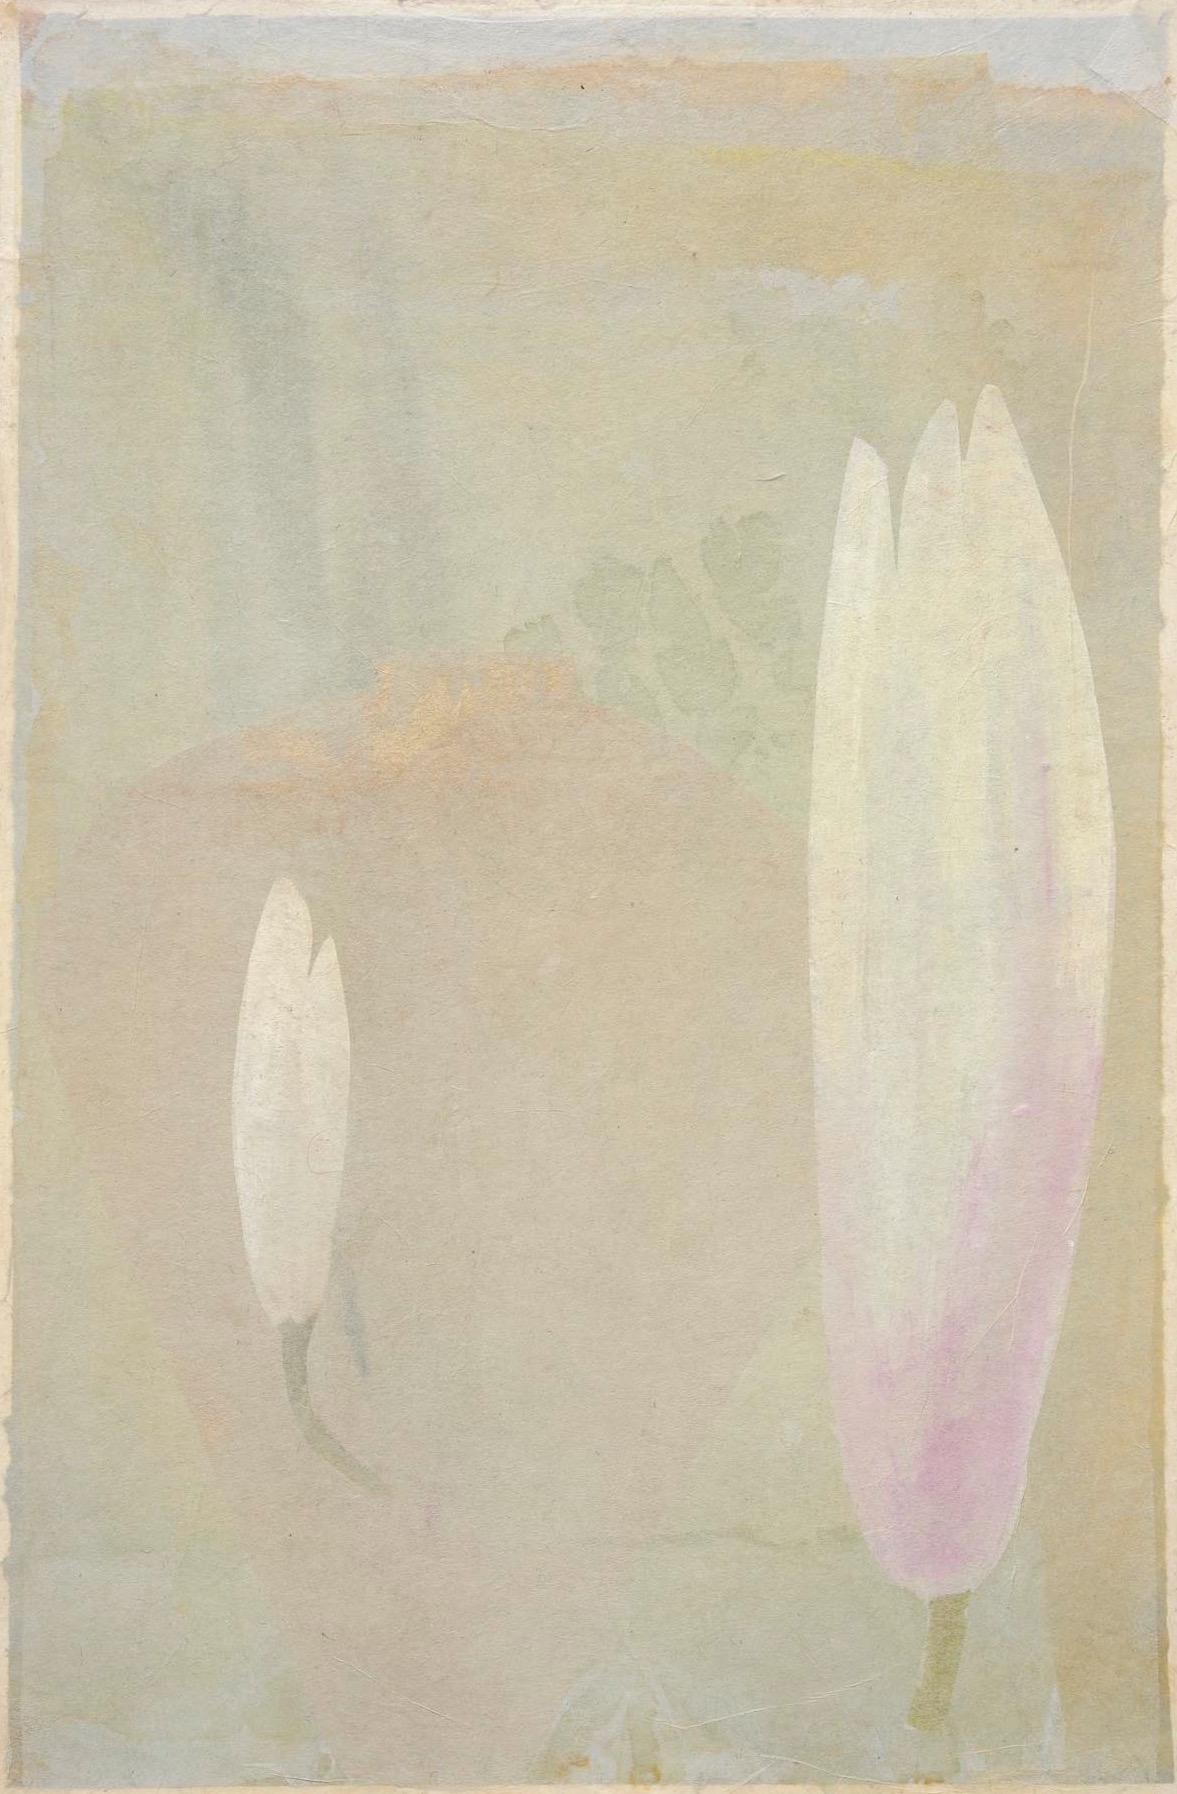 23_Magnolia - white flame_38x25cm.jpg